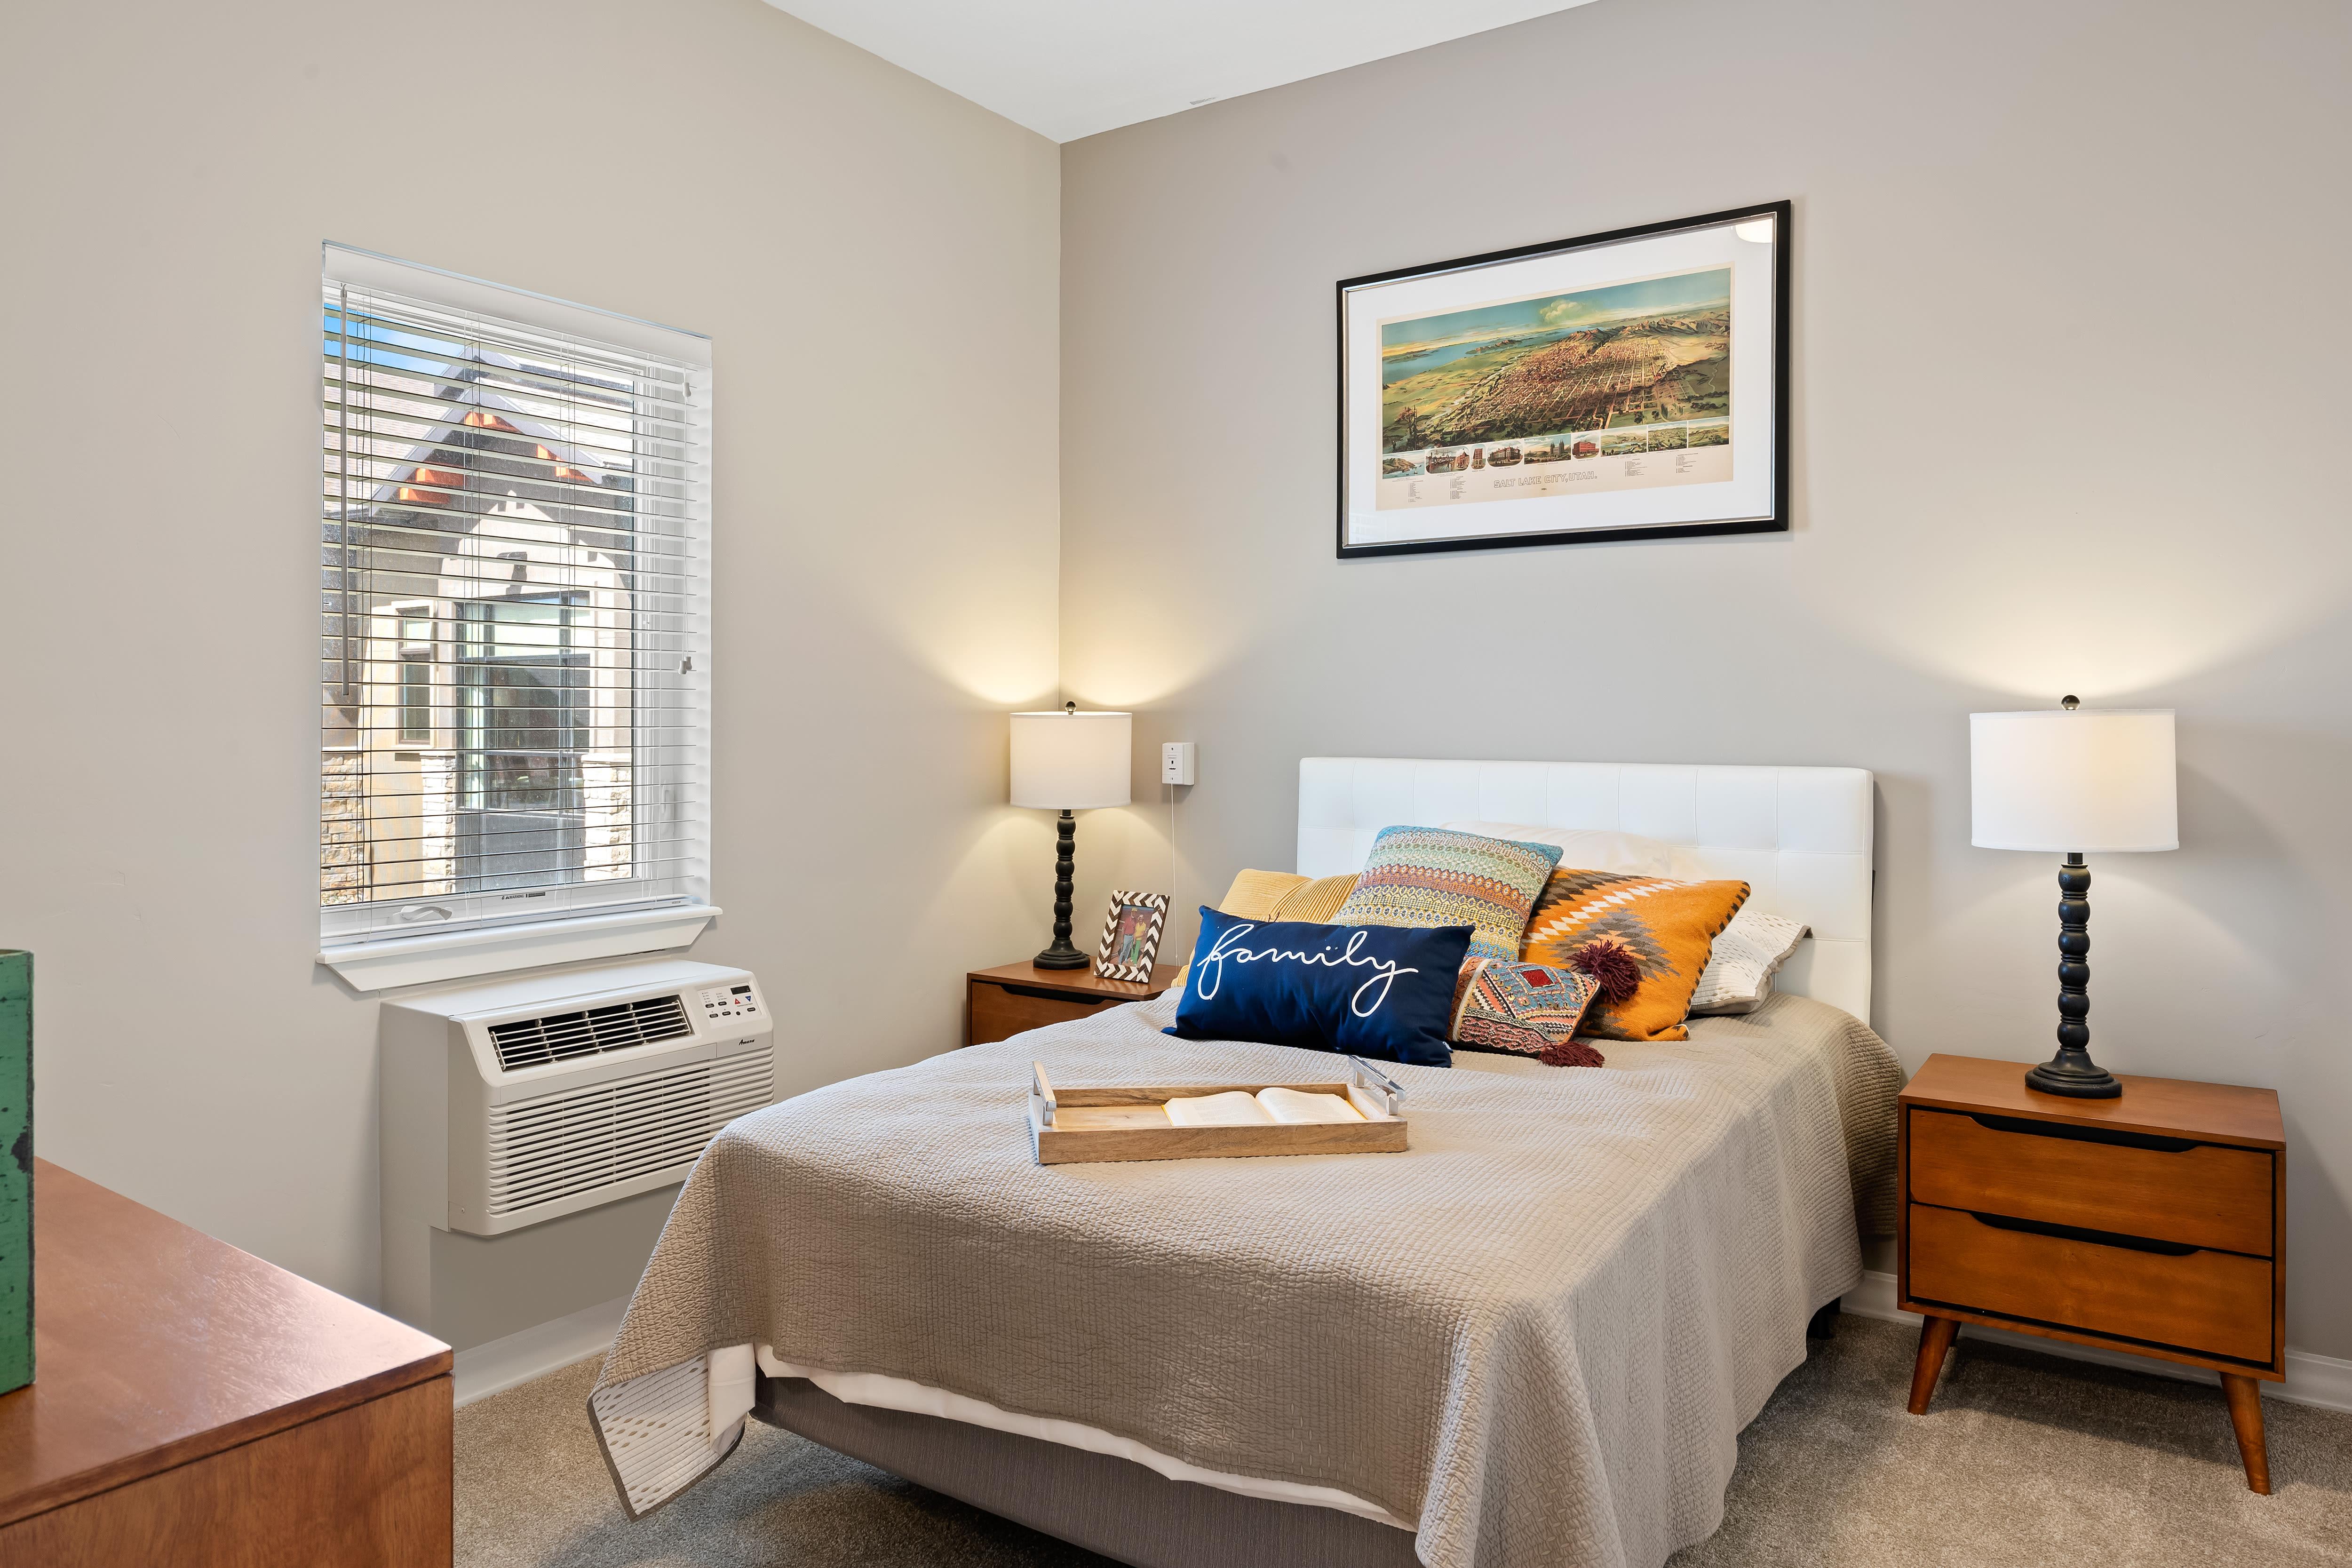 A resident bedroom at Anthology of South Jordan in South Jordan, Utah.